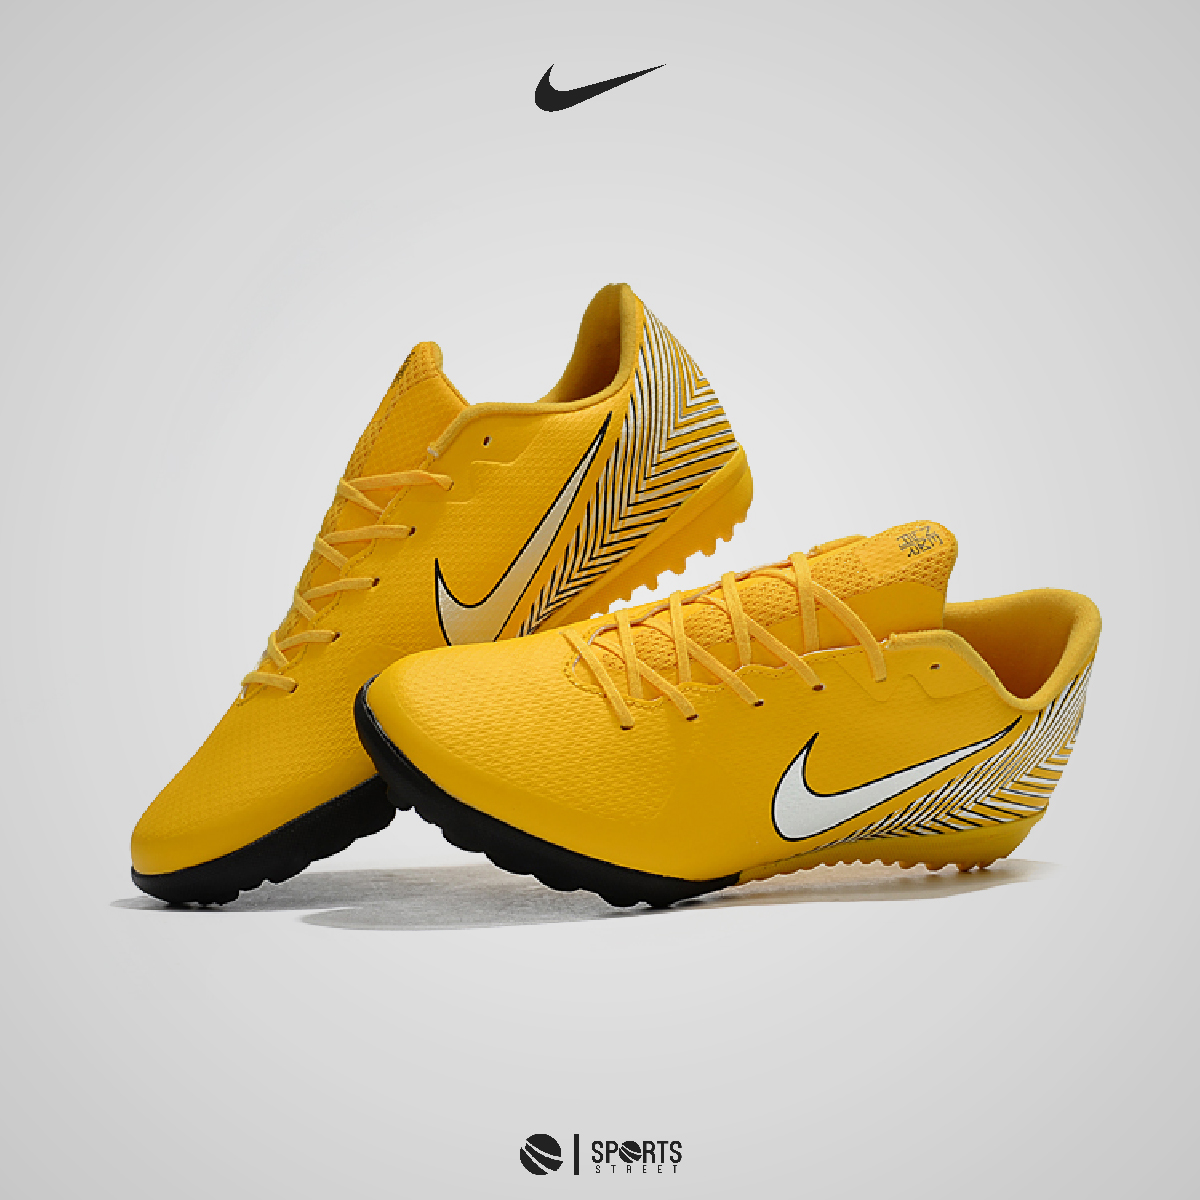 0814fb44684 ... Nike Mercurial Vapor XII Neymar Yellow TF Soccer Cleat ...